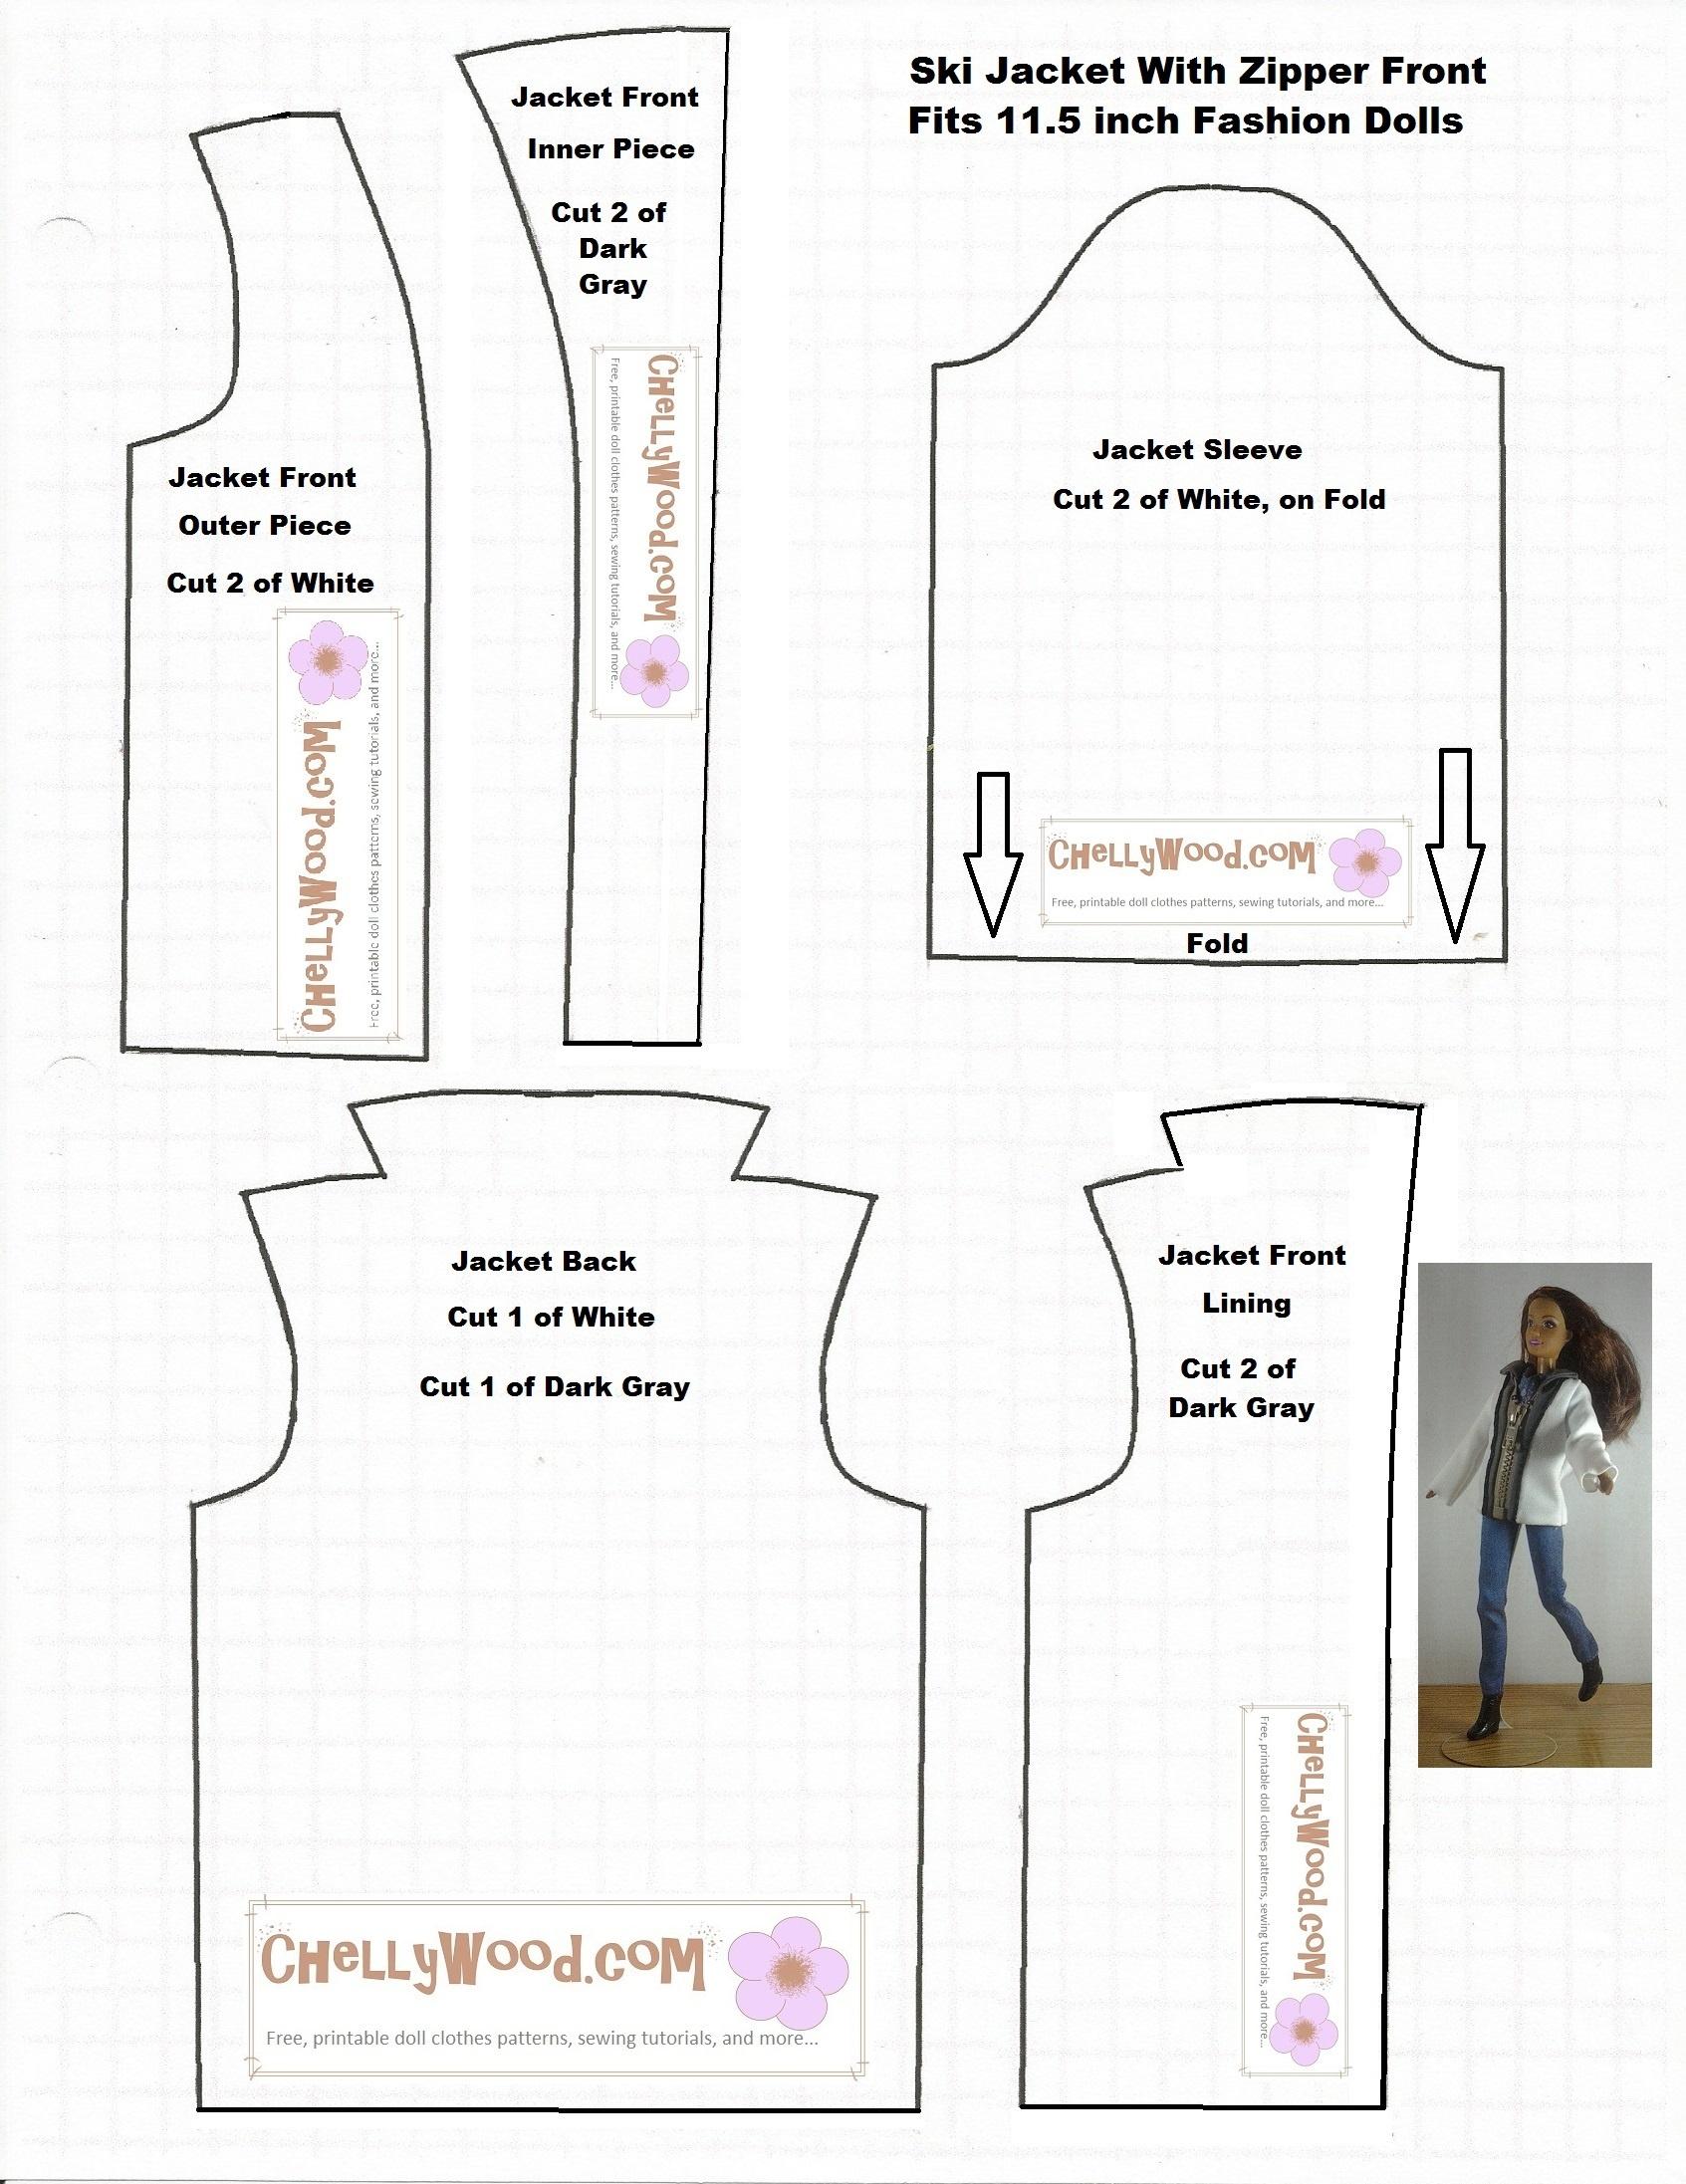 Barbie Dress Patterns Free Printable Pdf - Free Printable Barbie Doll Sewing Patterns Template